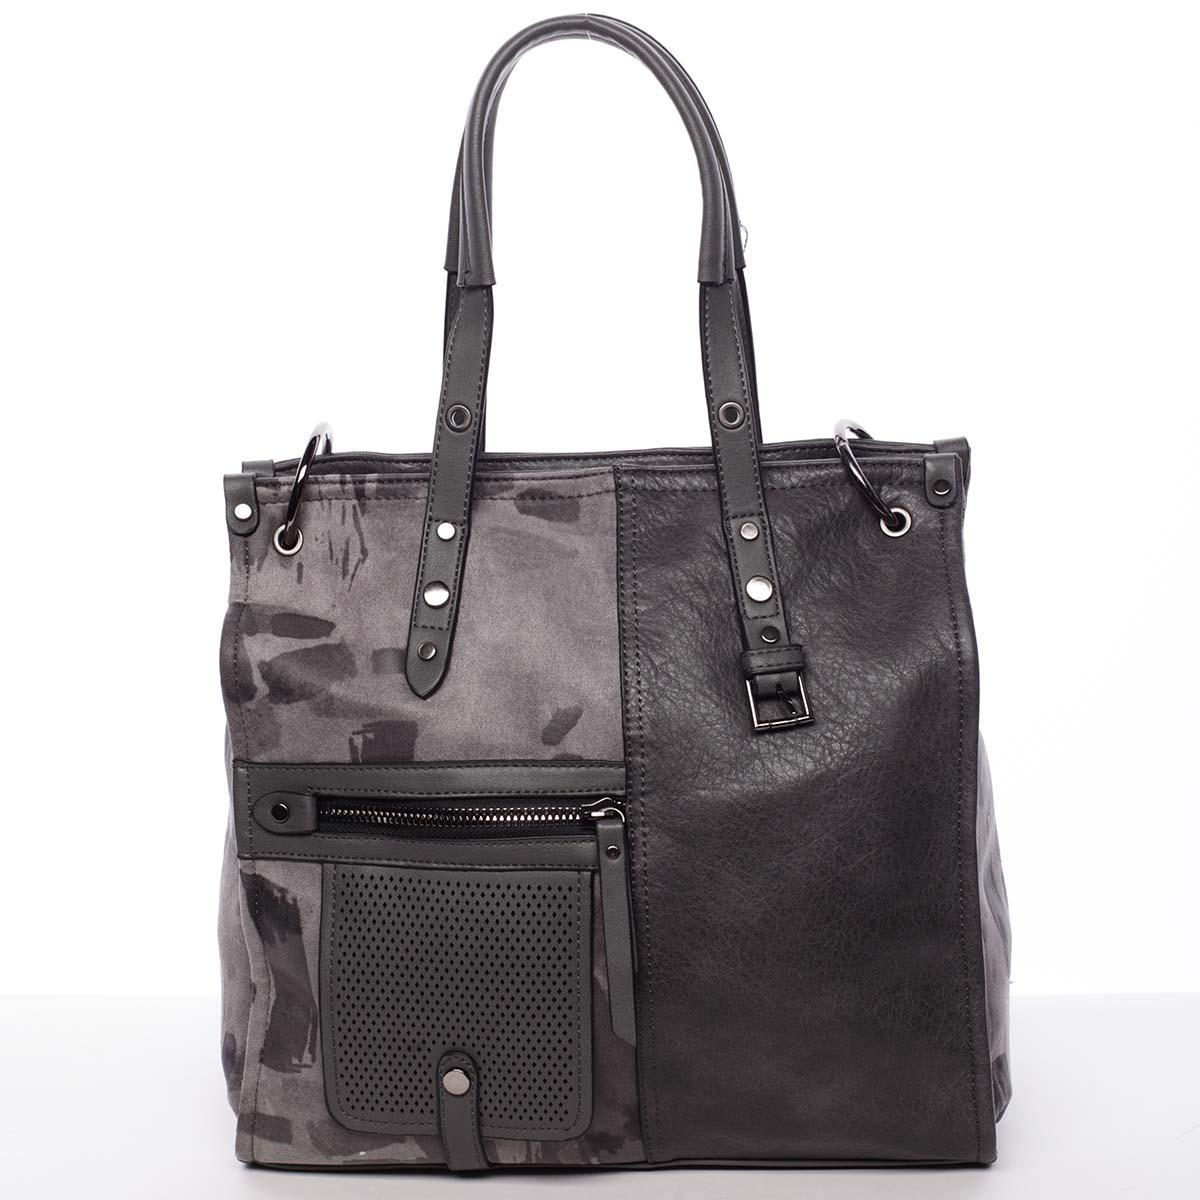 Nadčasová dámská kabelka do ruky šedá - MARIA C Jemma